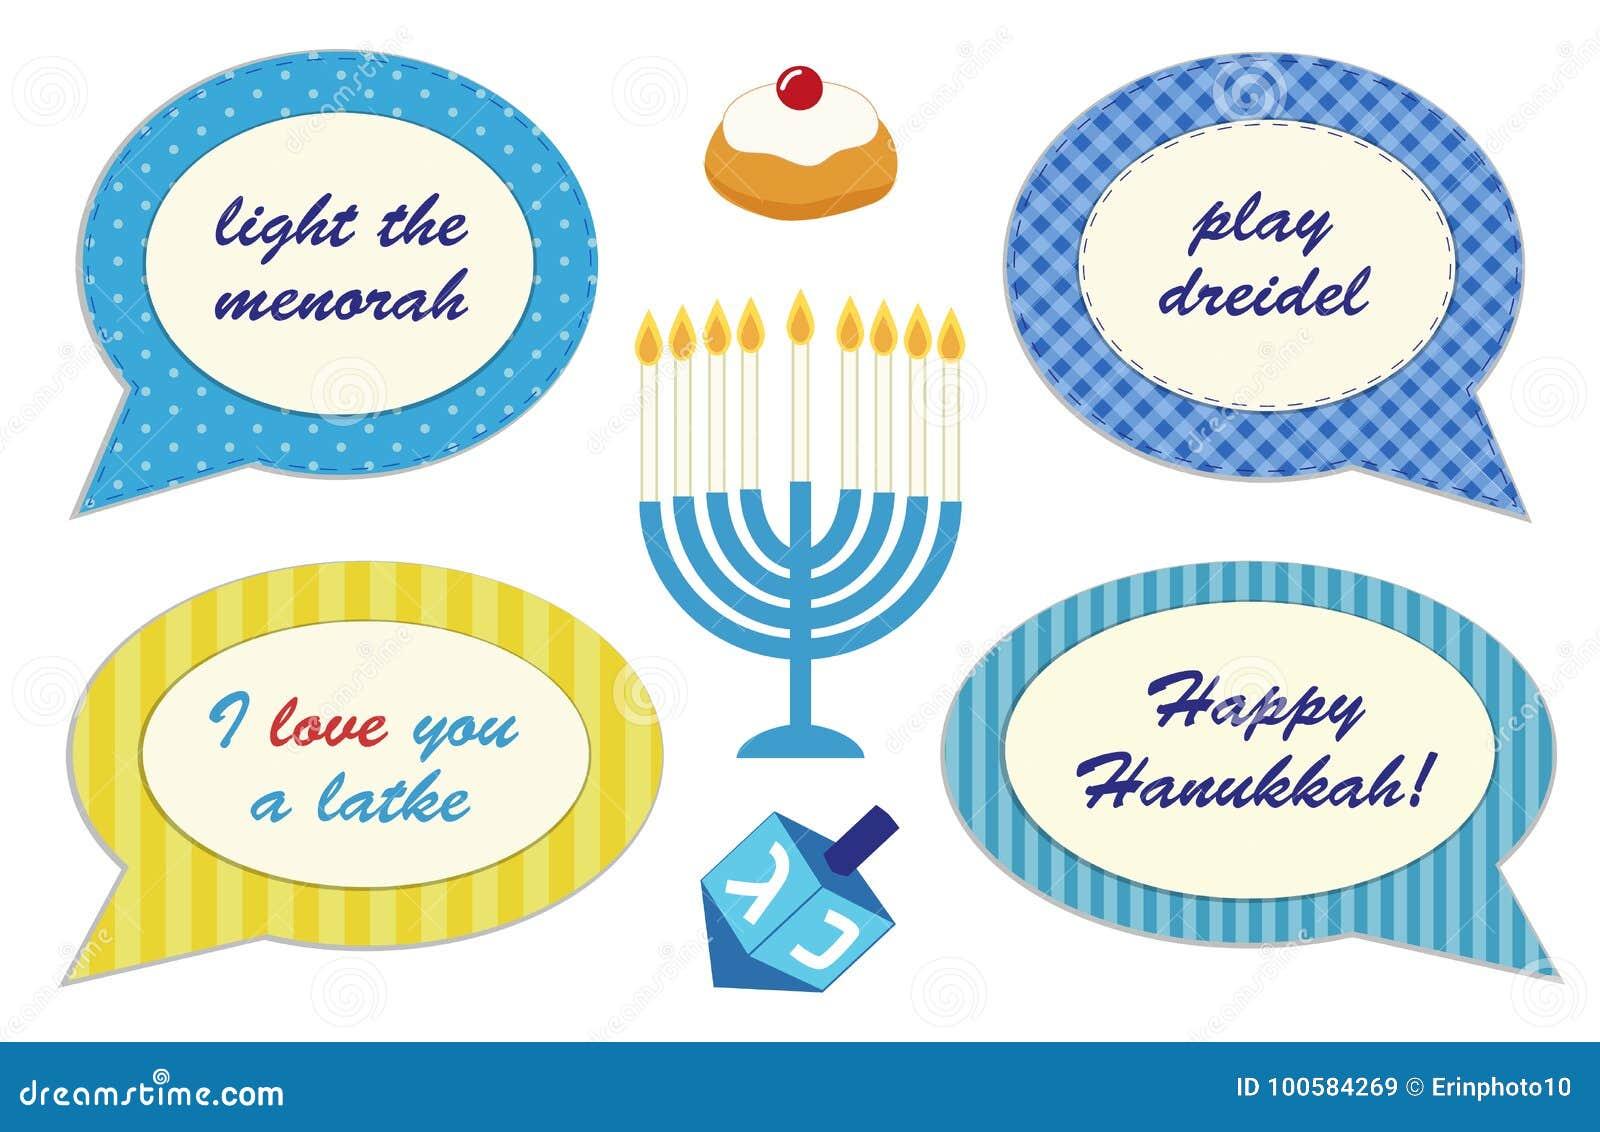 Hanukkah Photo and Selfie Prop Set